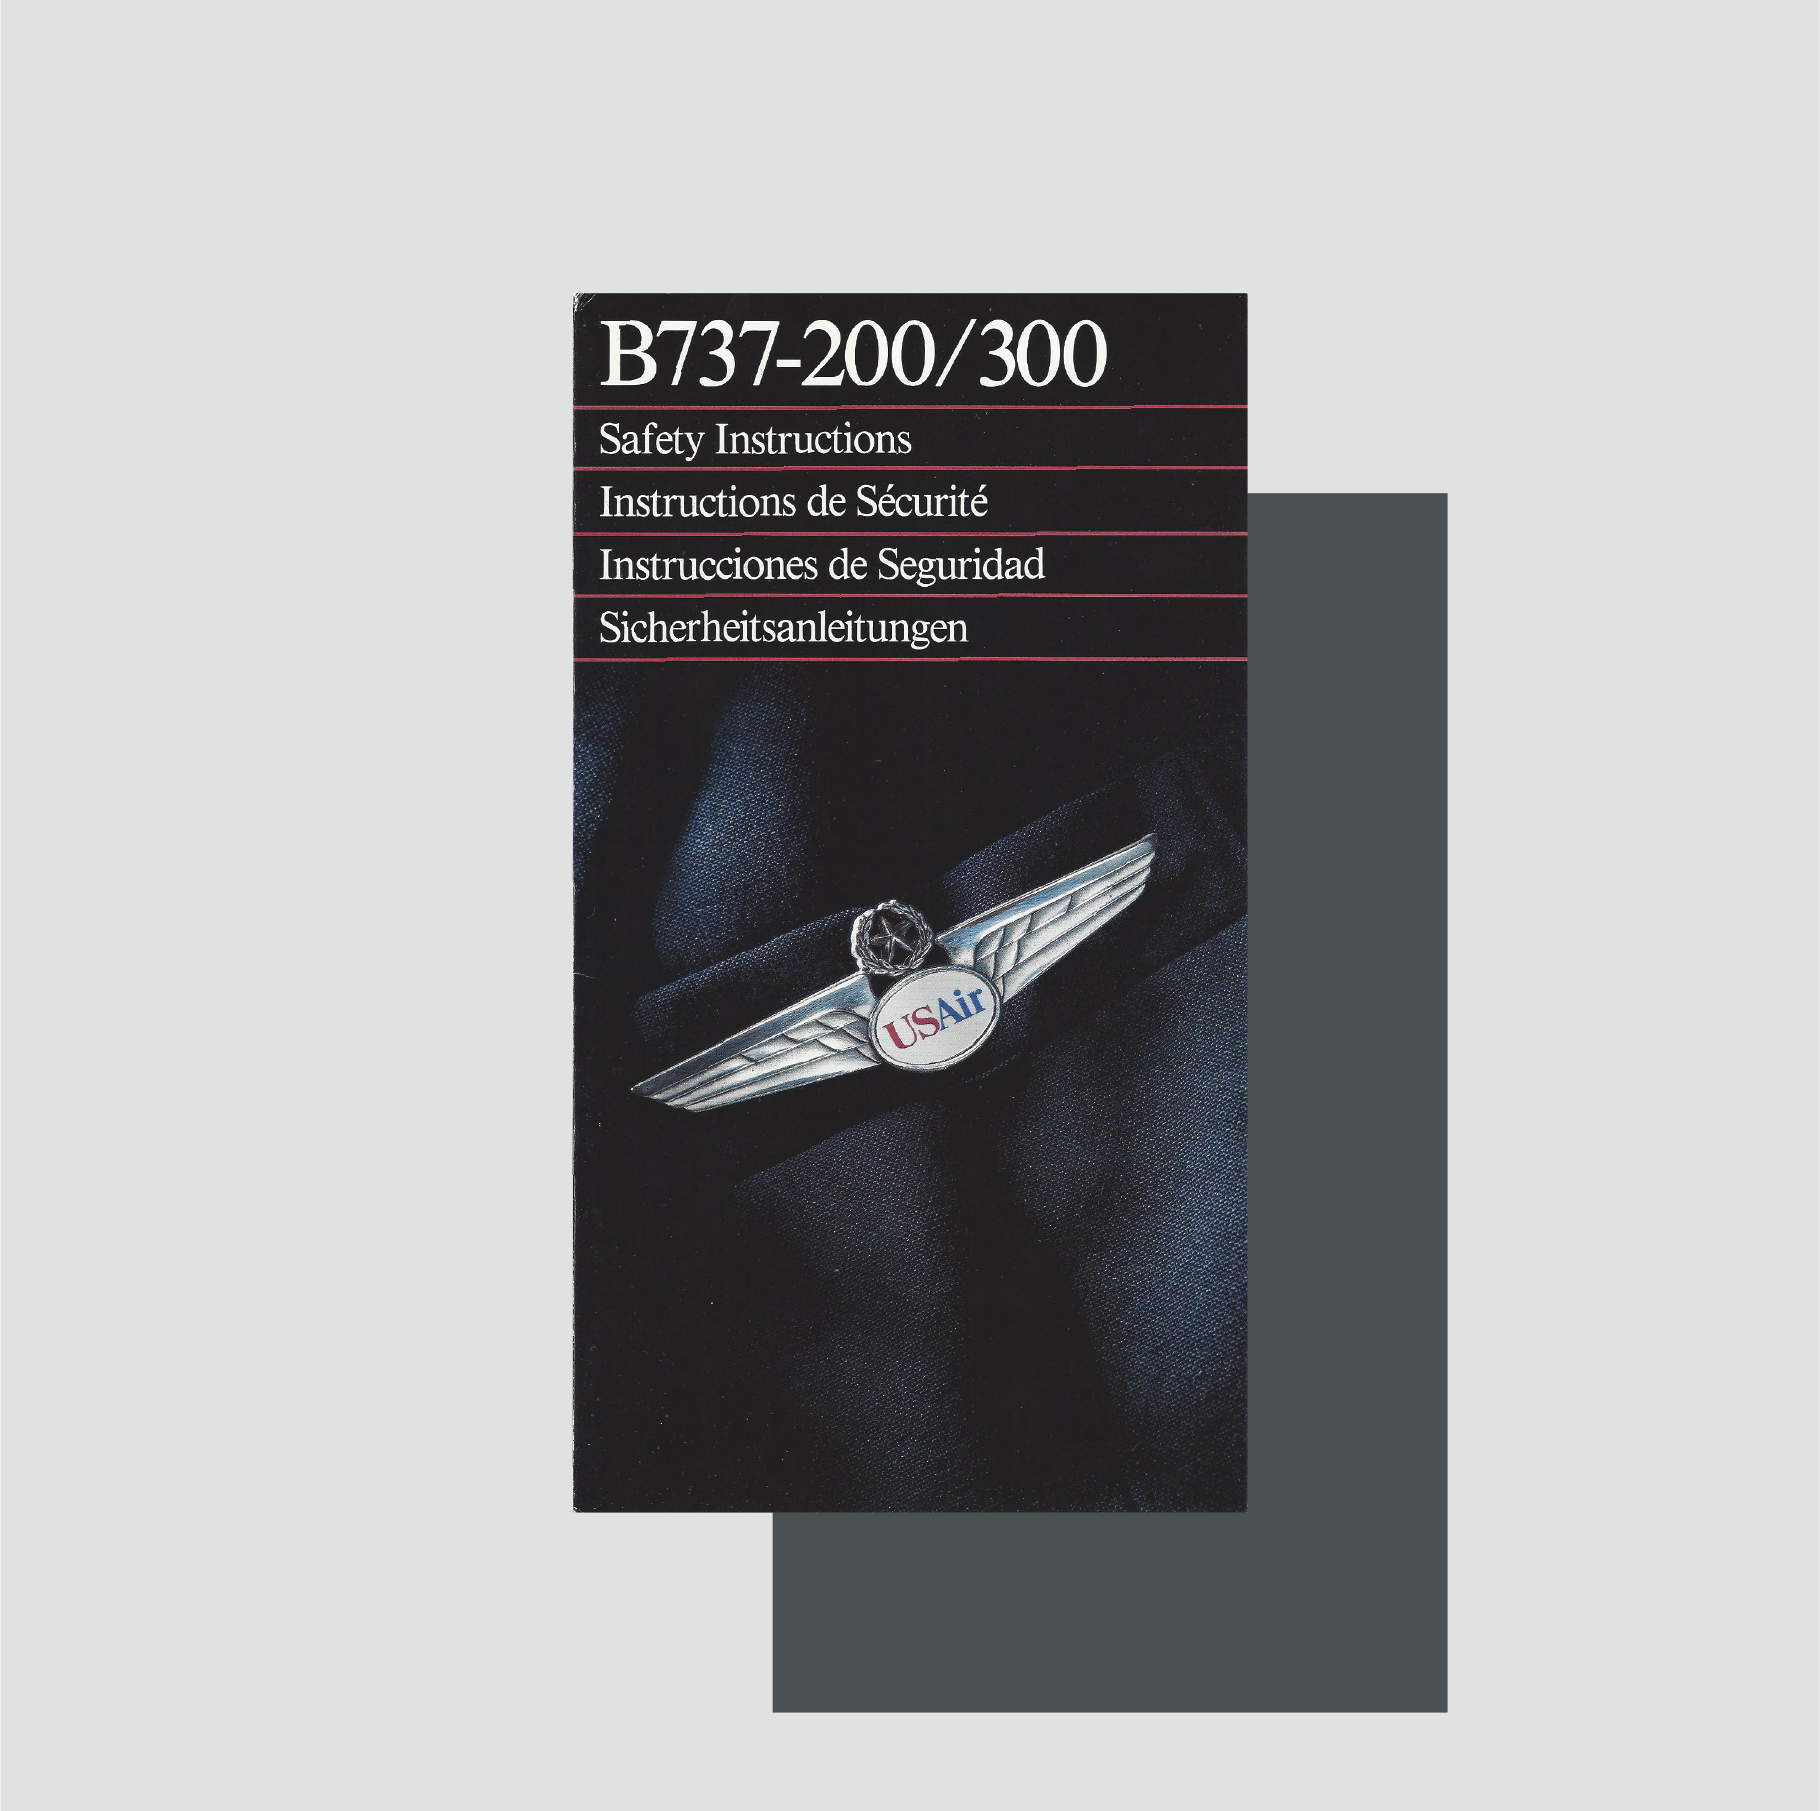 US Air B737-200/300